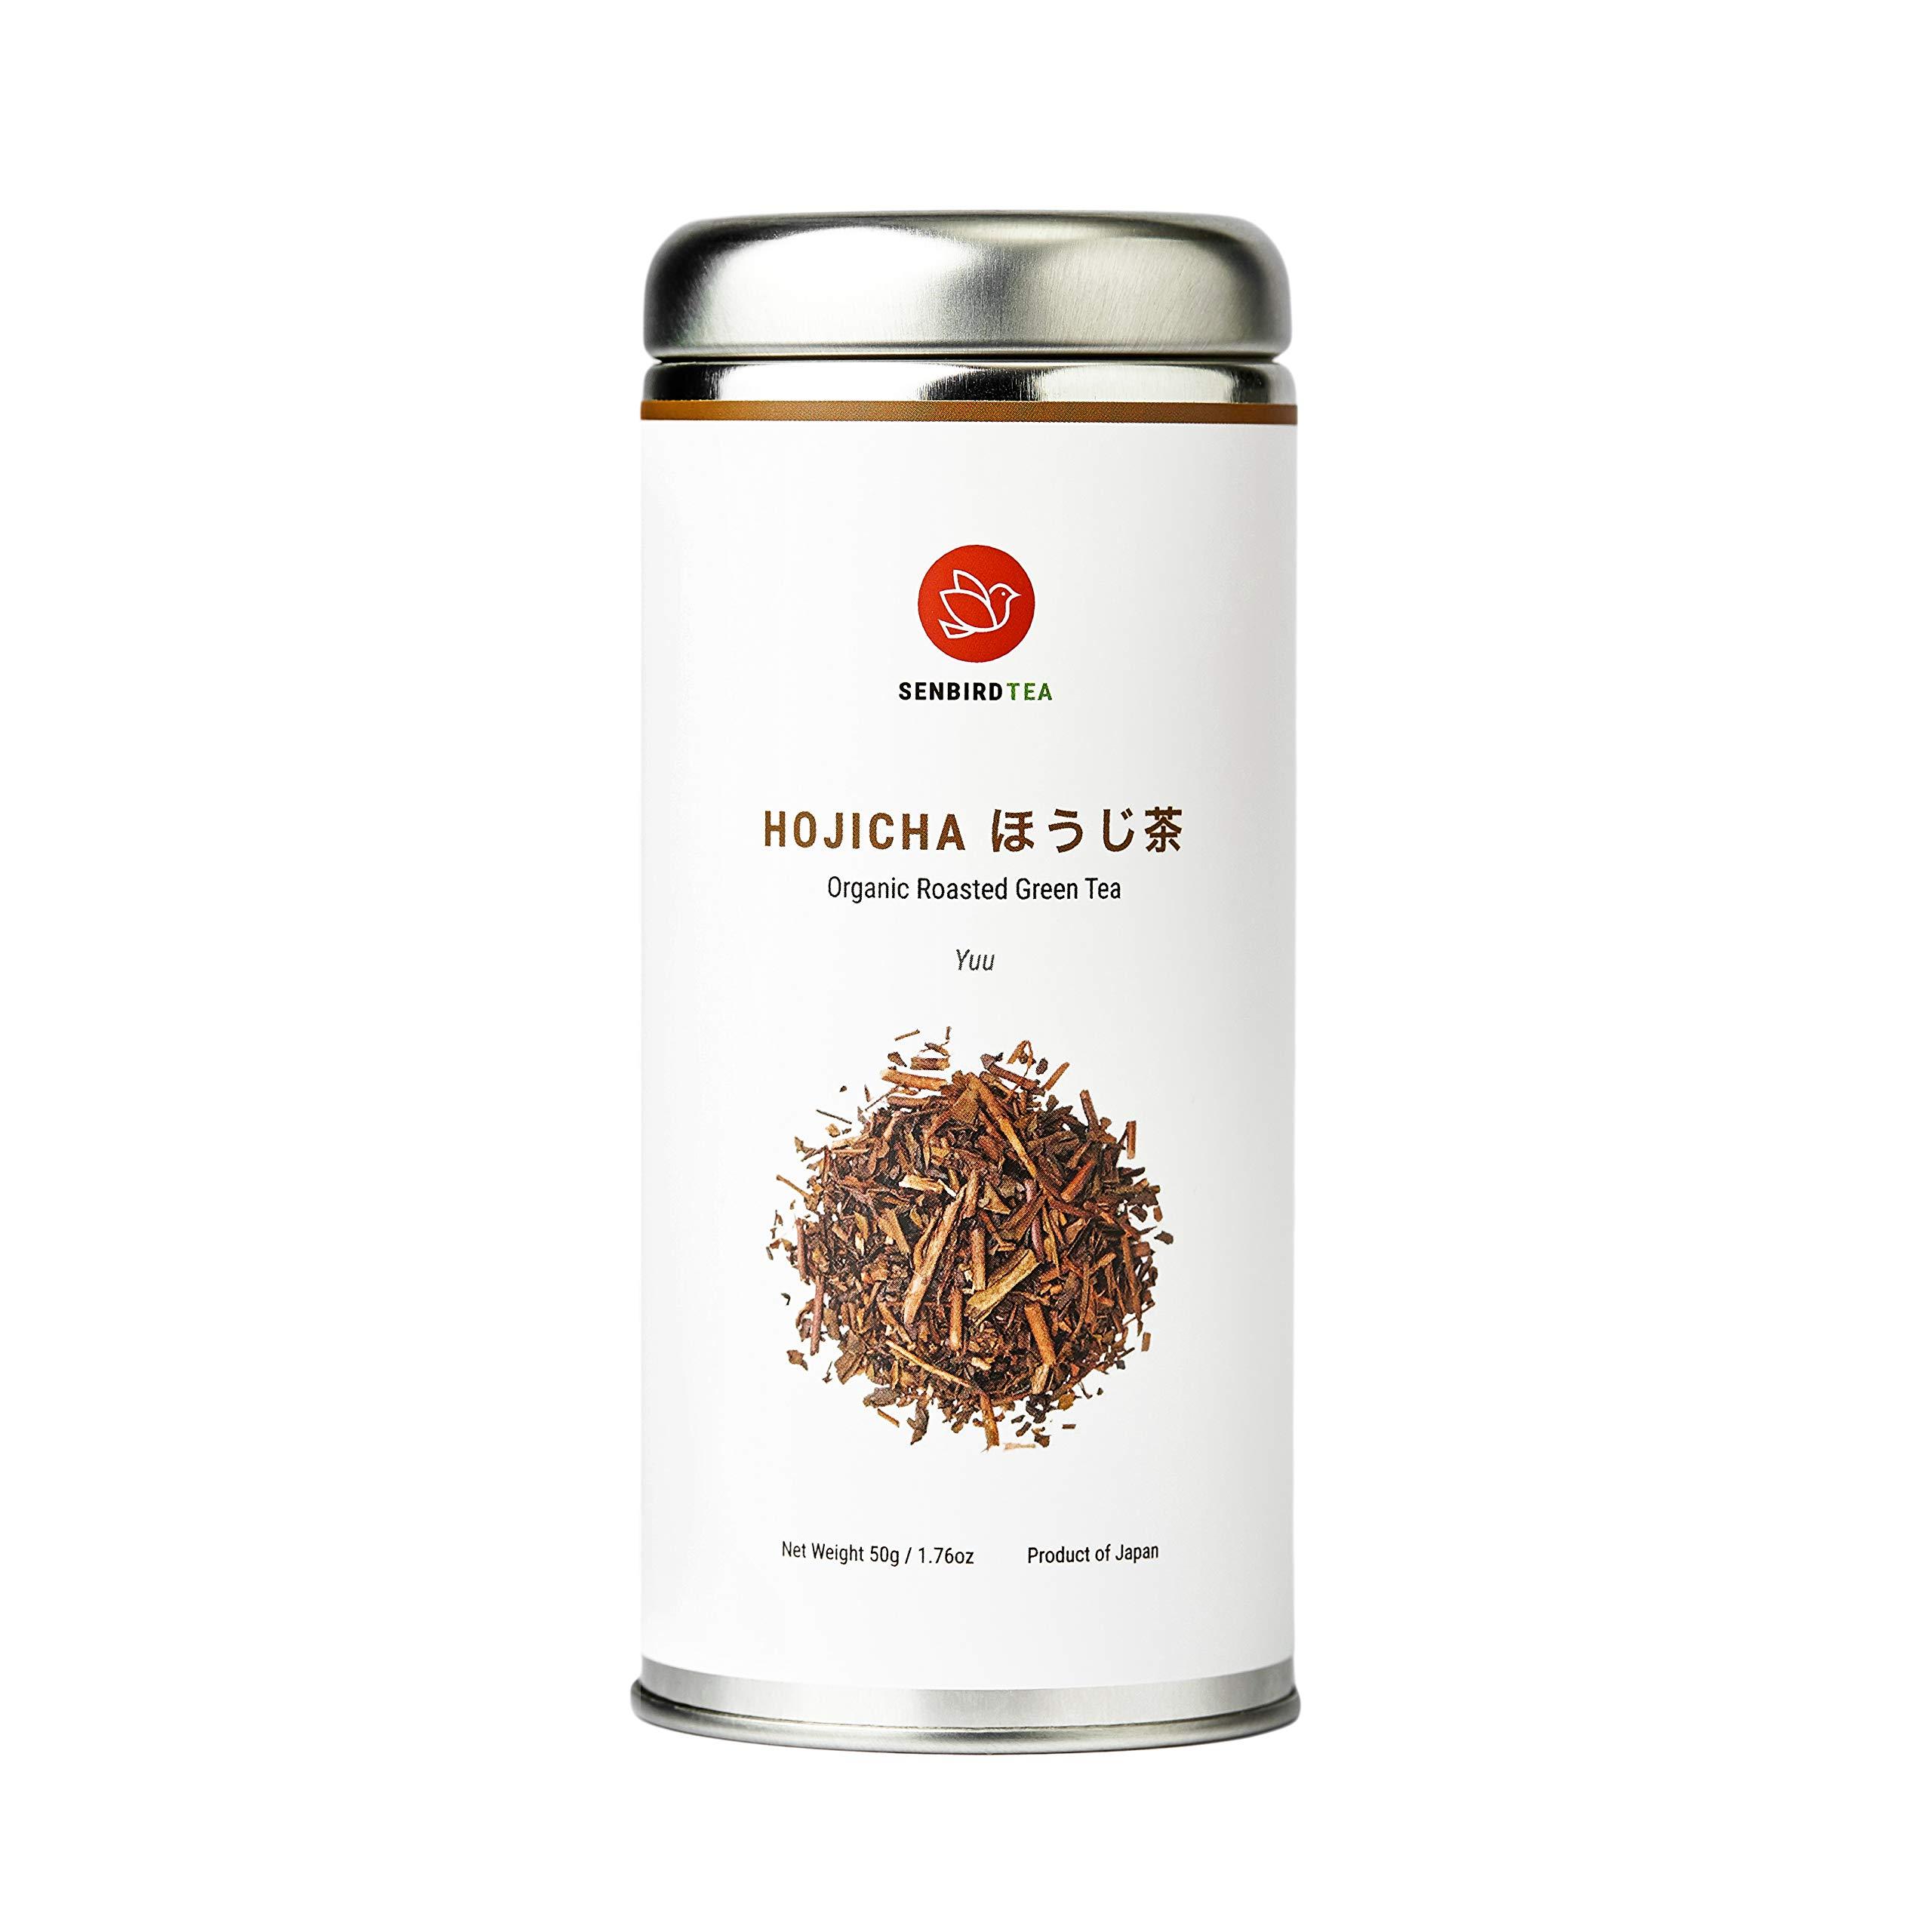 Senbird Organic Hojicha Roasted Green Tea - Hojicha Yuu | 50g Japanese Roasted Green Tea Houji Tea From Shizuoka, Japan | Organic Japanese Loose Leaf Green Tea in Airtight Tea Tin